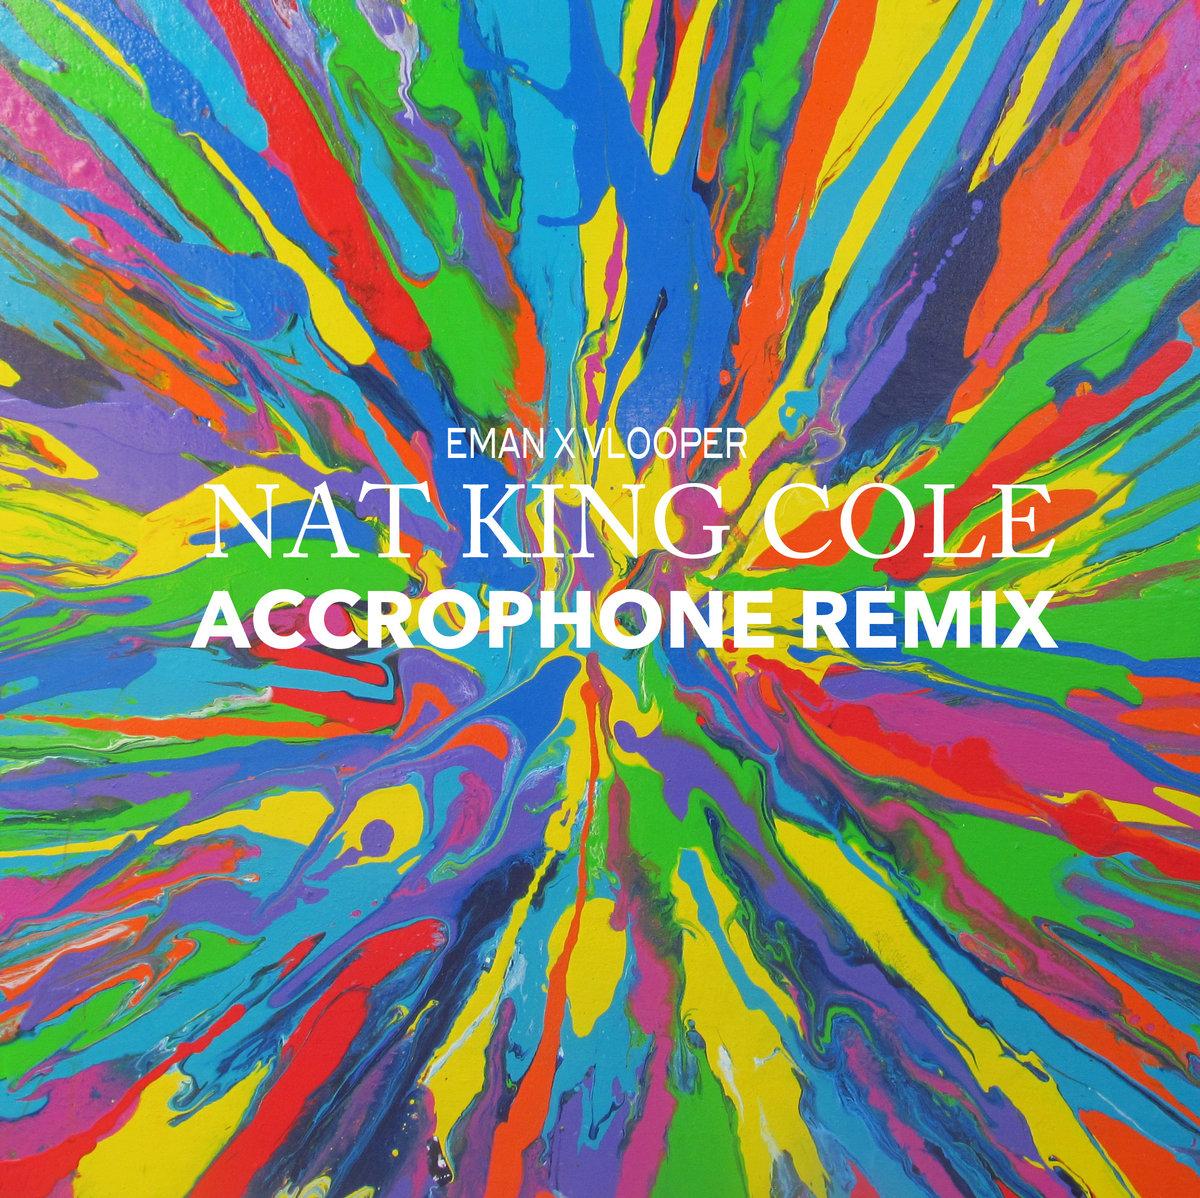 Accrophone | Free Internet Radio | Slacker Radio